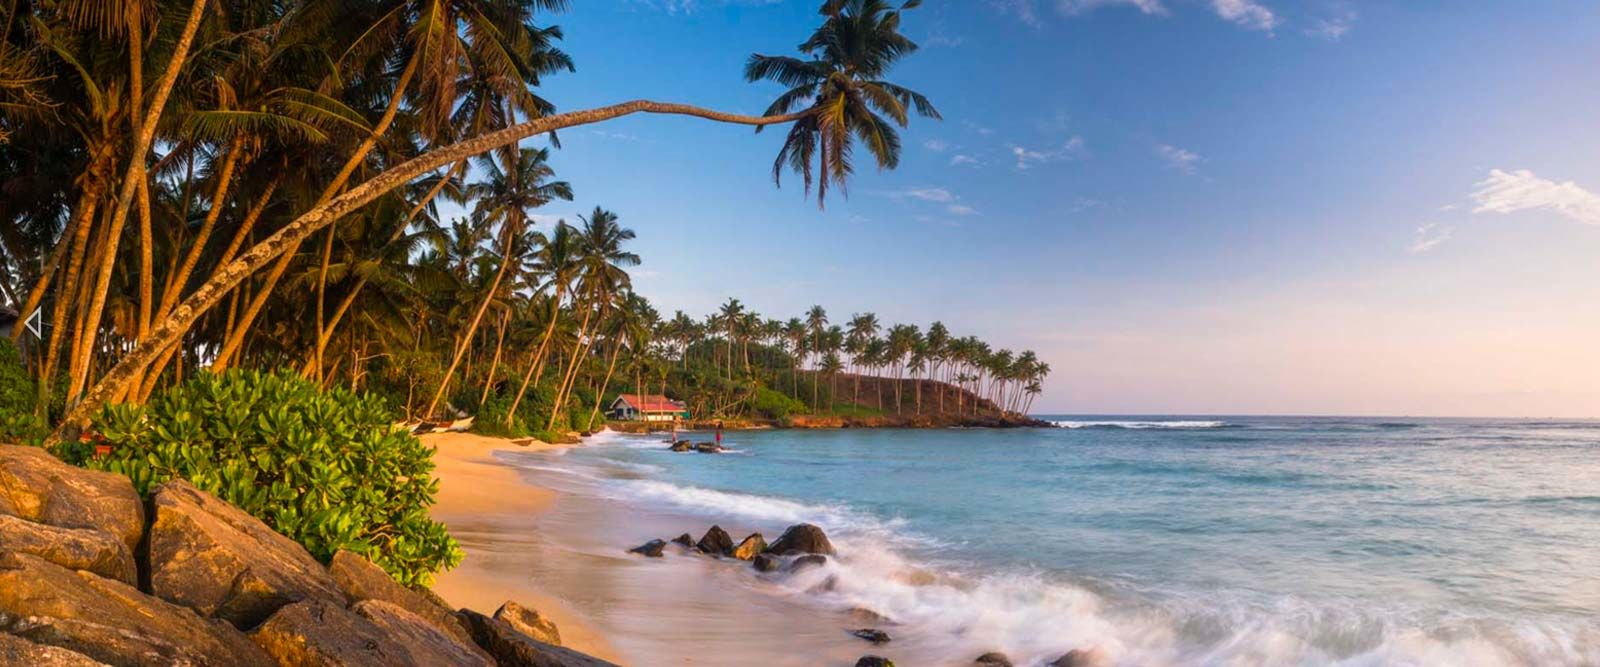 Mirissa Southern Coastline of Sri Lanka